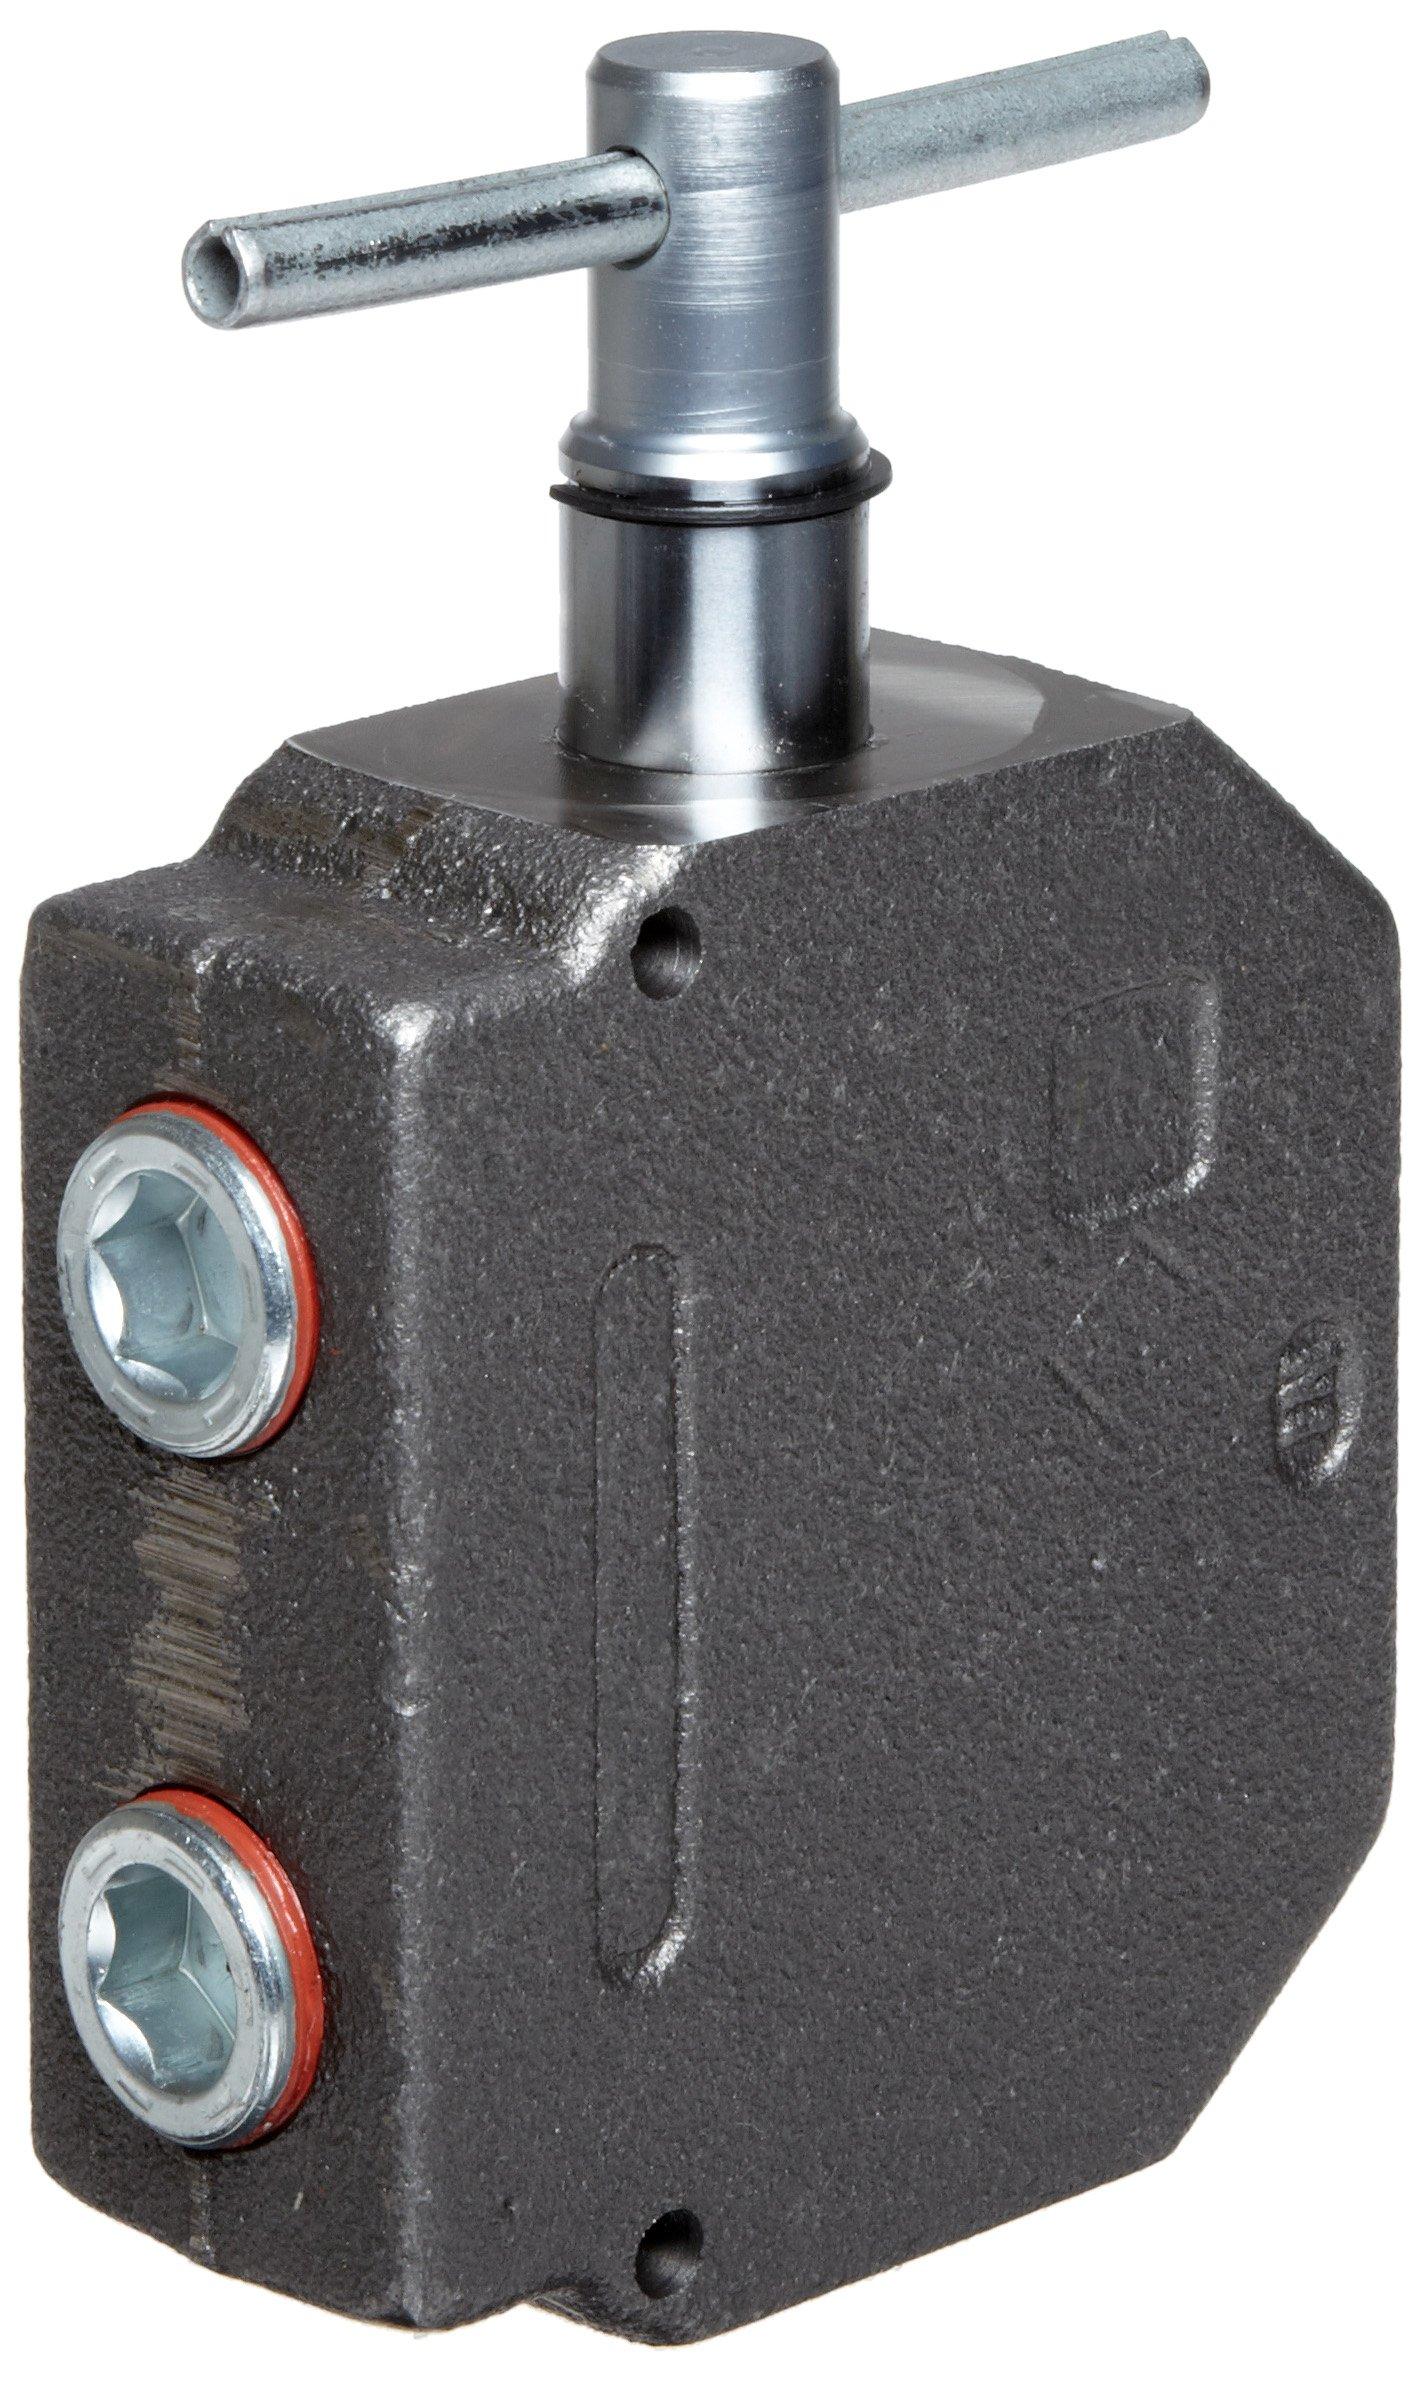 Prince RD-975 Selector Valve, Monoblock, 1 Spool, 3 Ways, 2 Positions, T-Handle, 3000 psi, 30 gpm, 3/4'' NPT Female